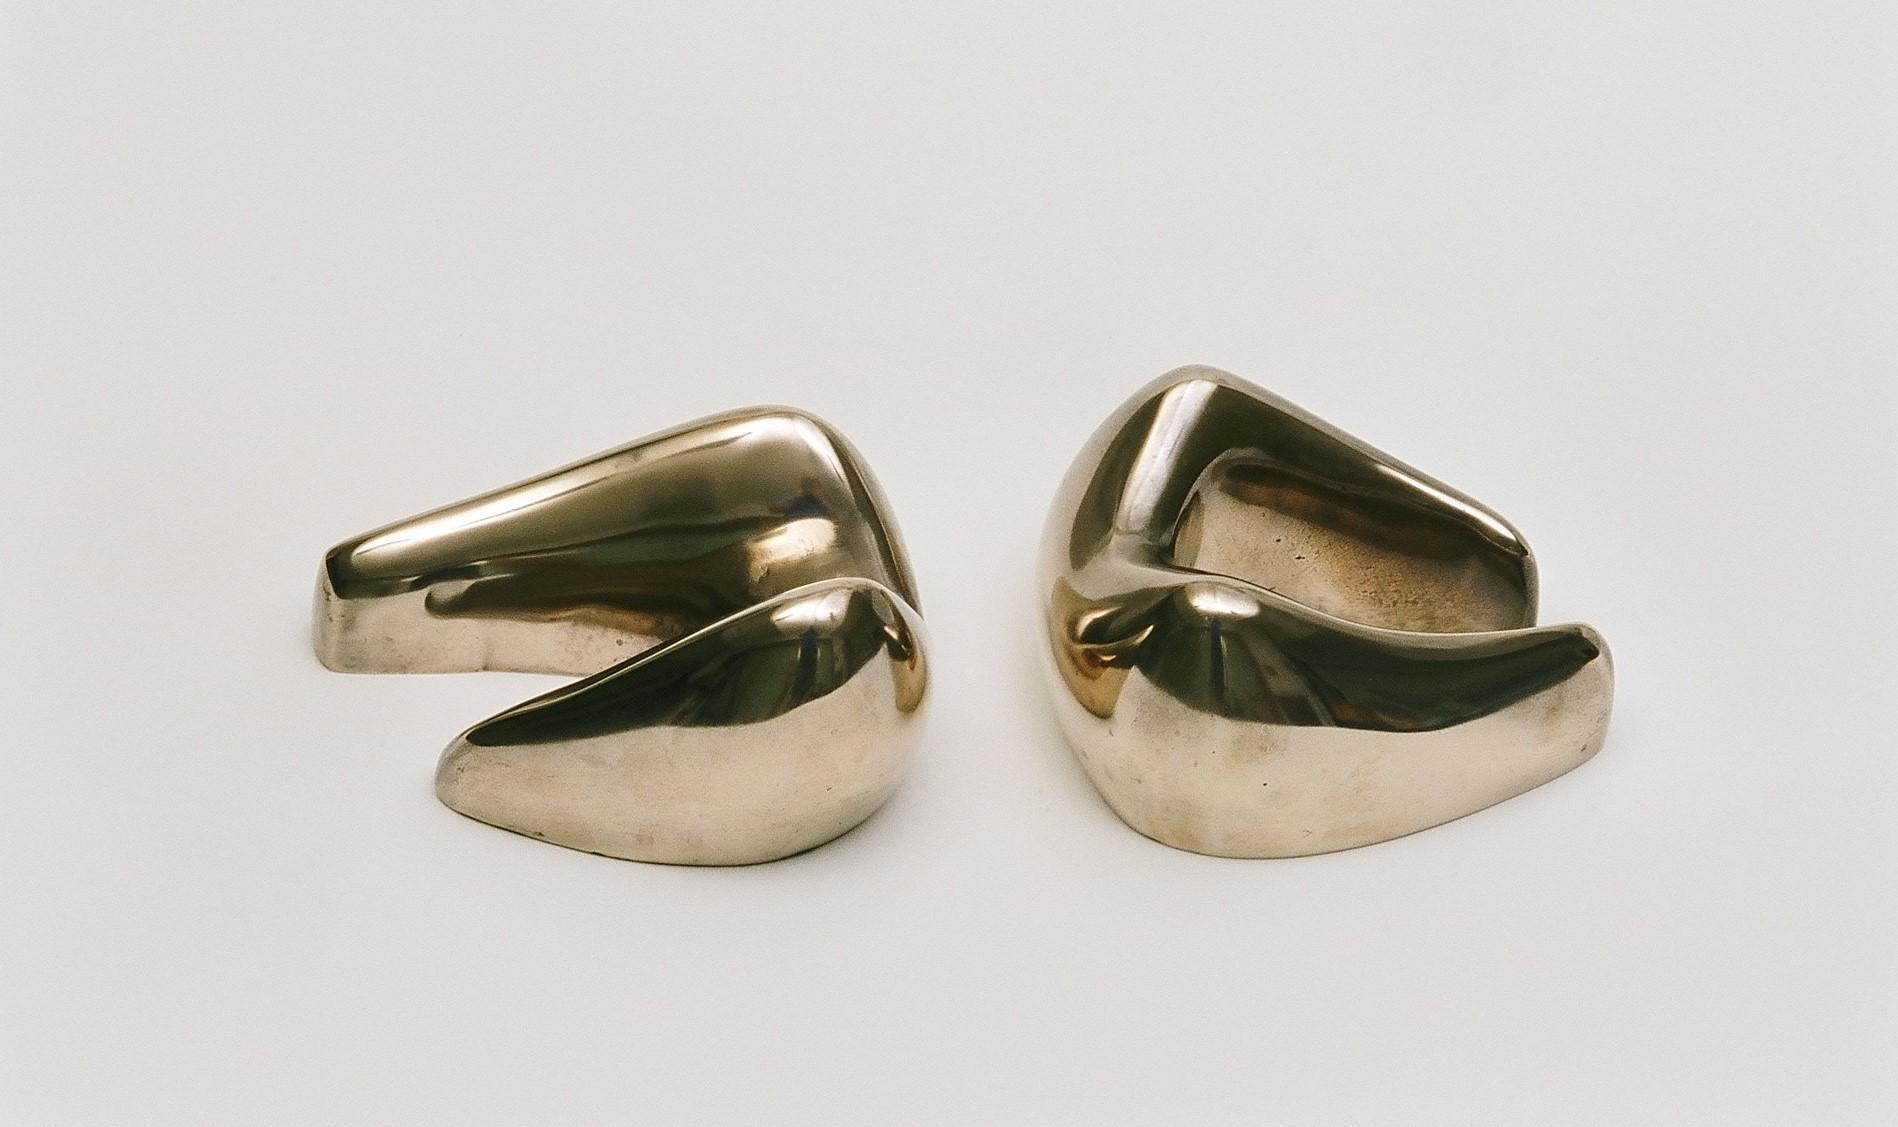 Two-piece reclining figure 31x17x10 cm. [polished bronze]